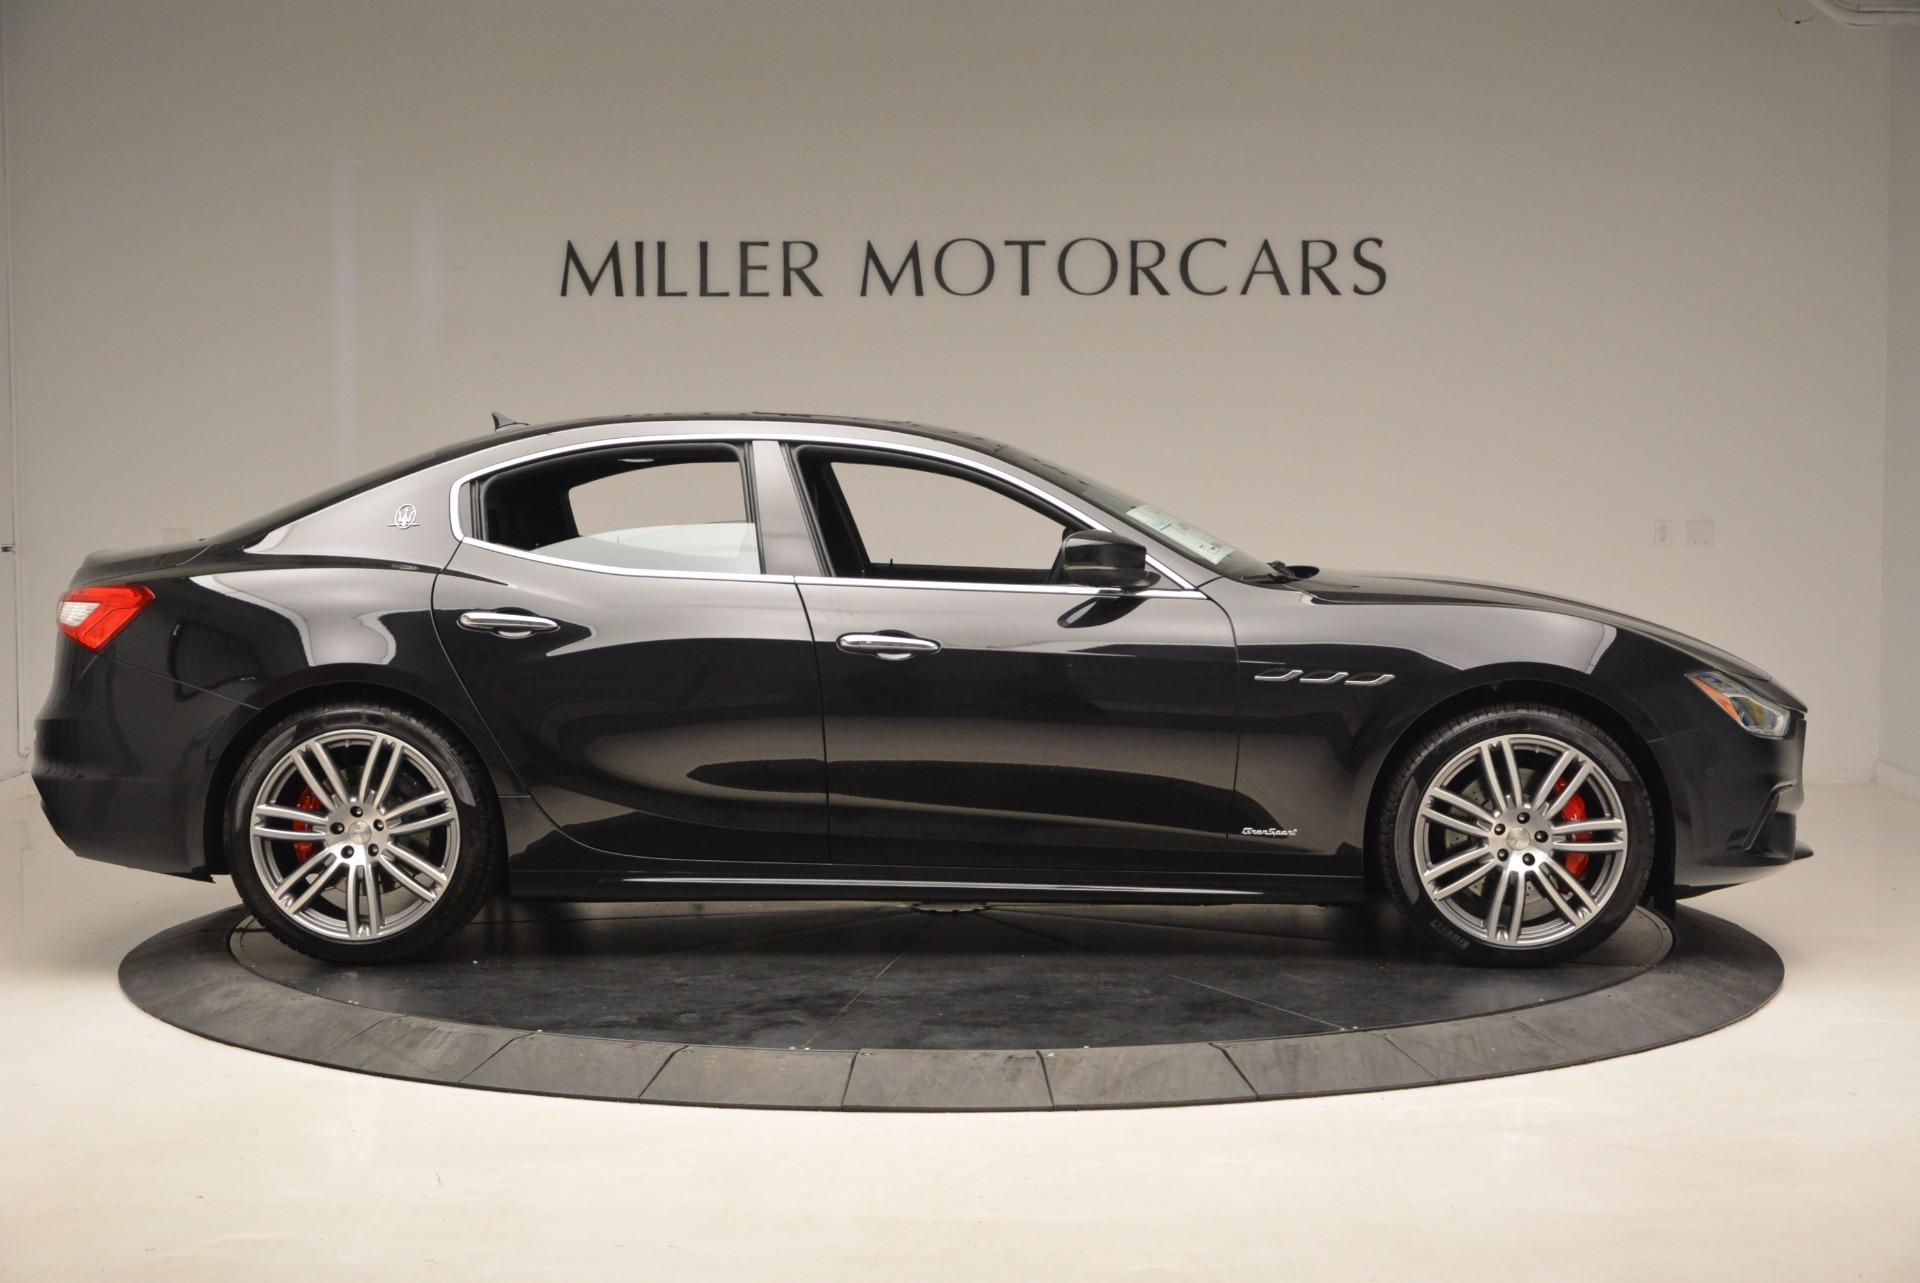 New 2018 Maserati Ghibli S Q4 GranSport For Sale In Greenwich, CT 1541_p9